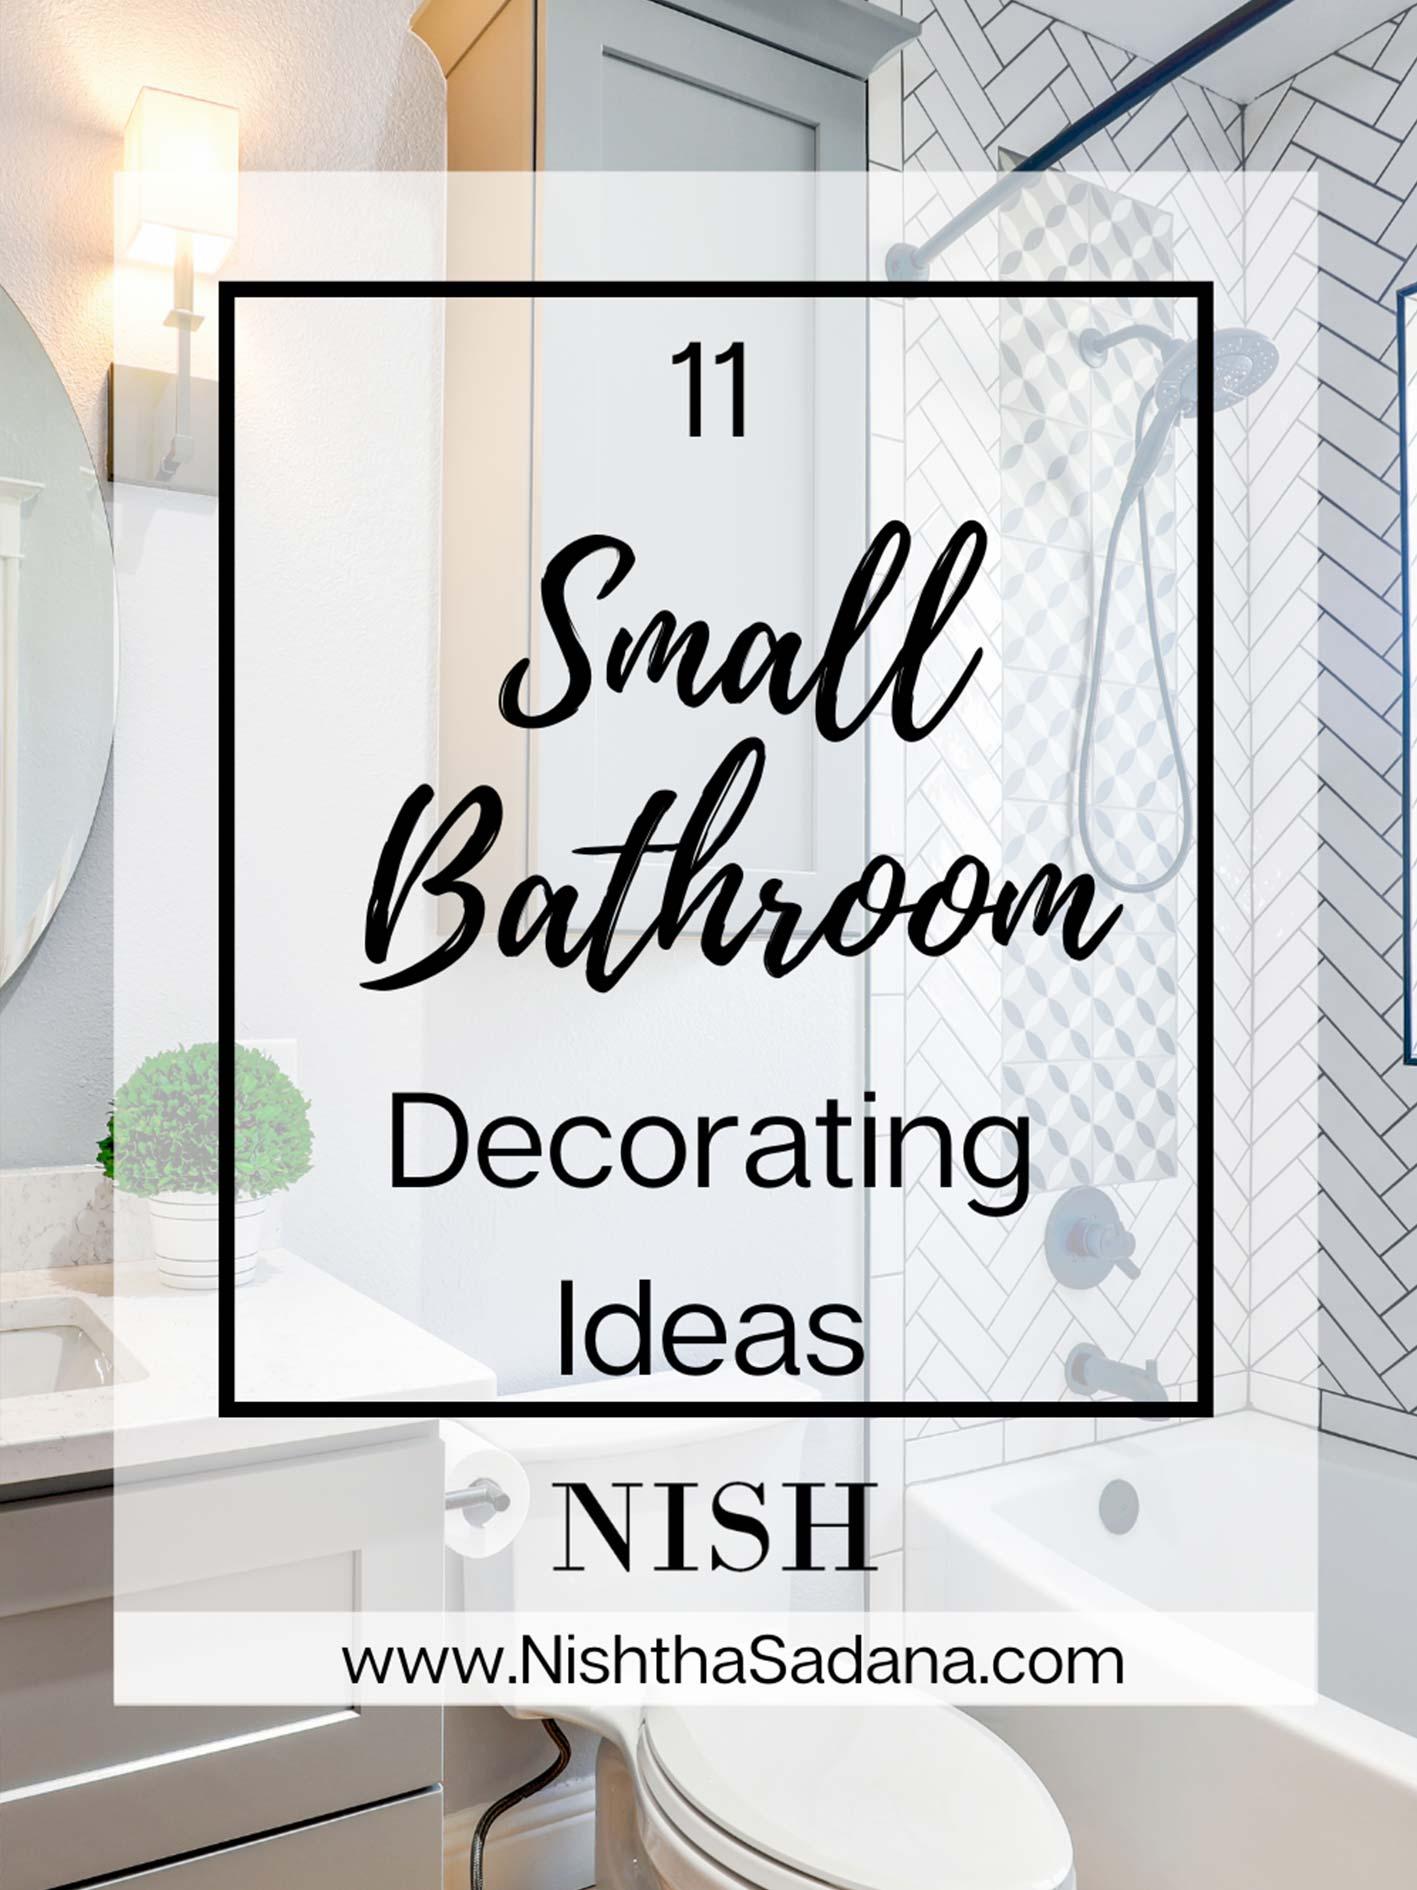 11 Small Bathroom Decorating Ideas Nish, Decorating Ideas For Bathroom